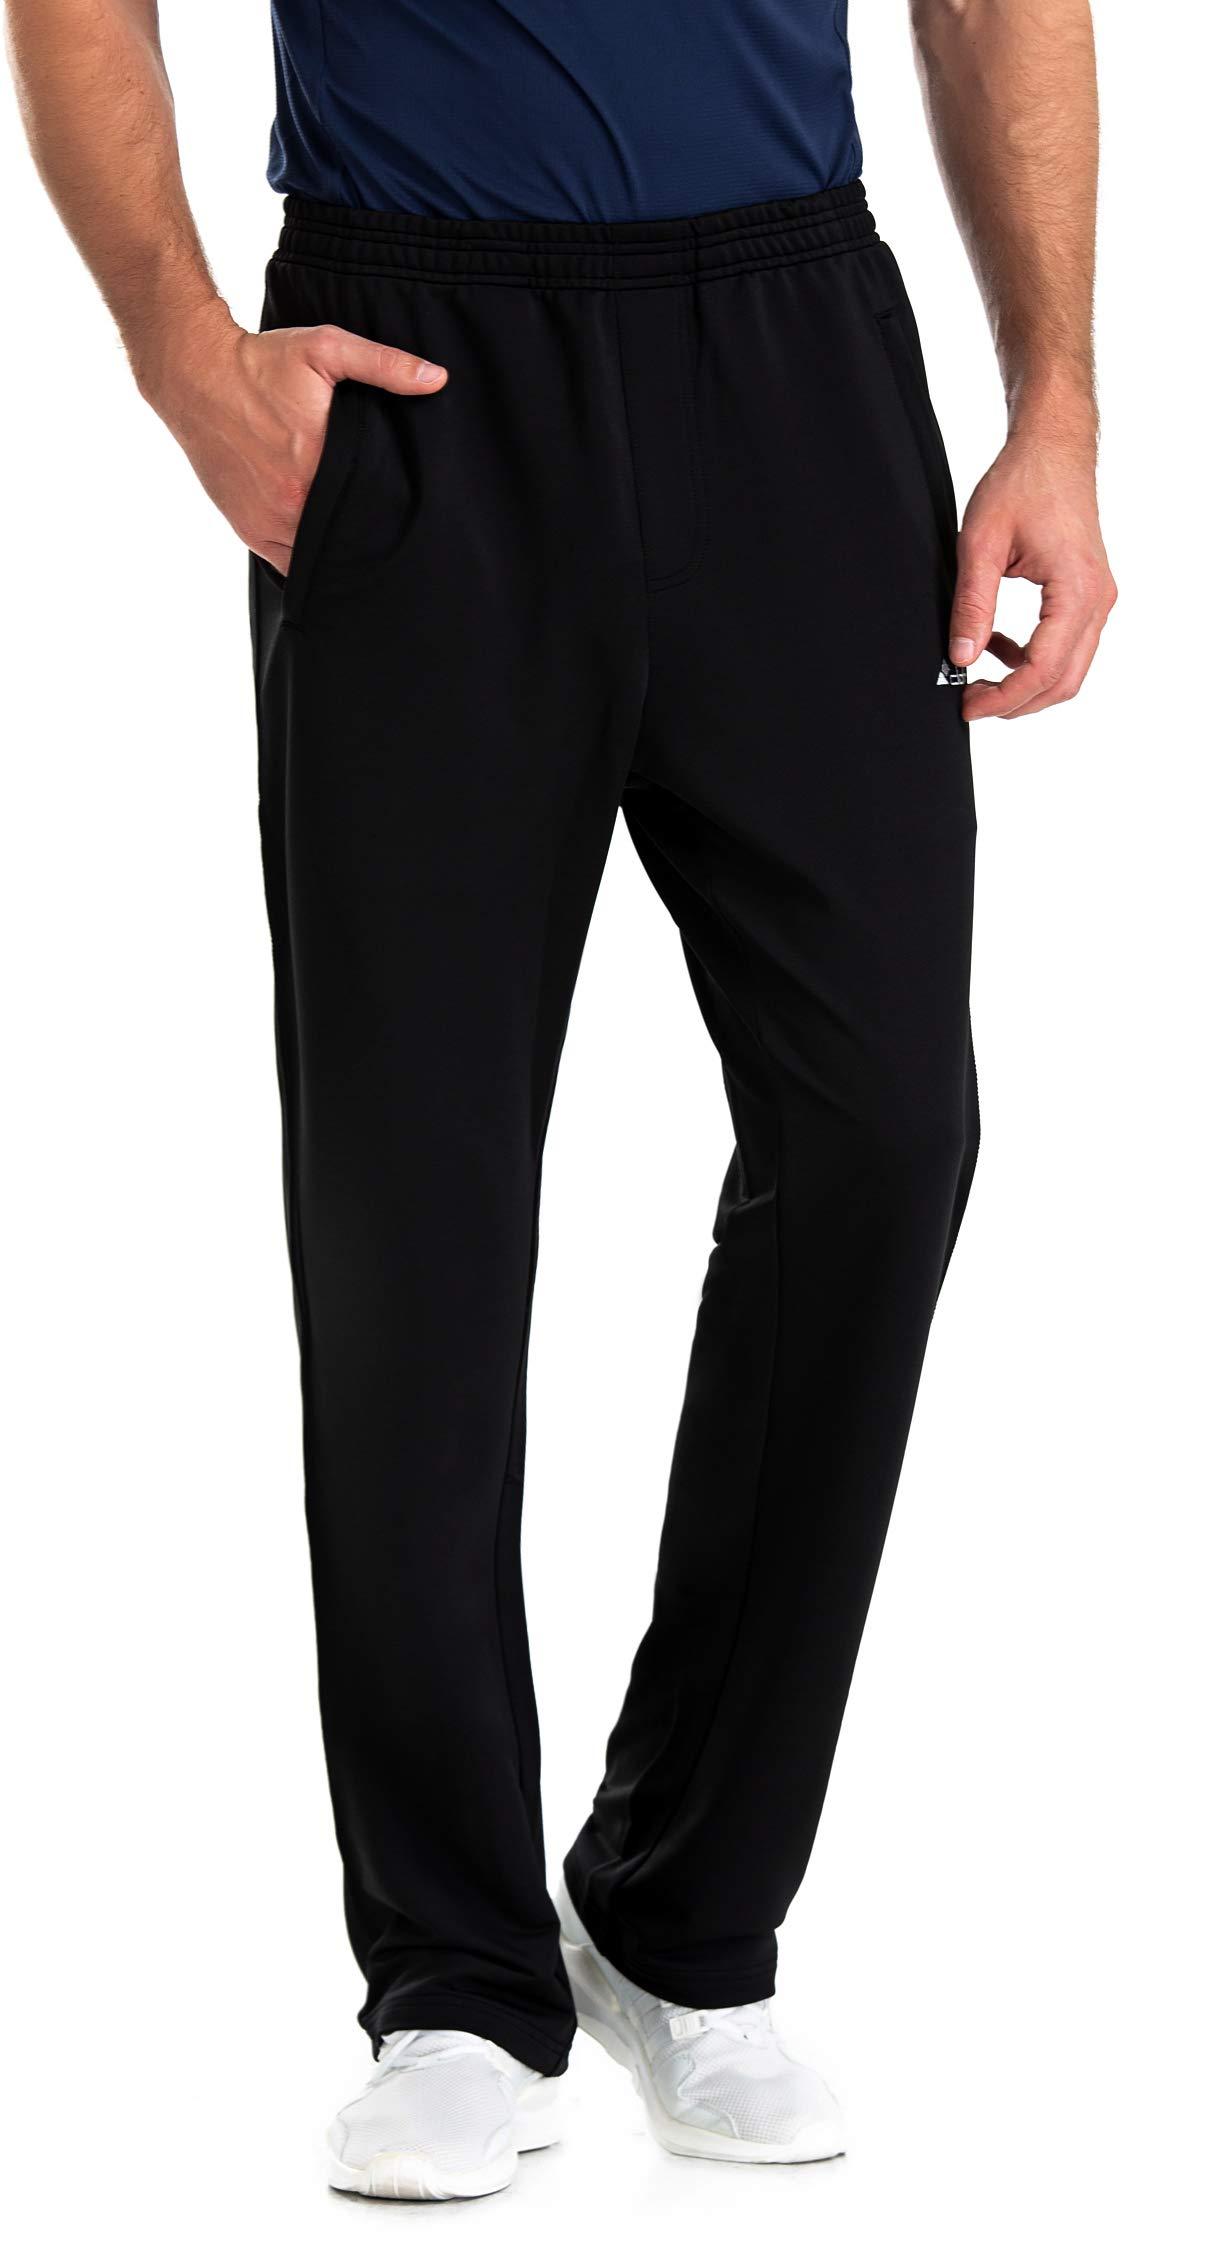 Clothin Men's Sweatpant with Zipper Pockets Elastic Waist Drawstring Pants for Athletic Jogging Running